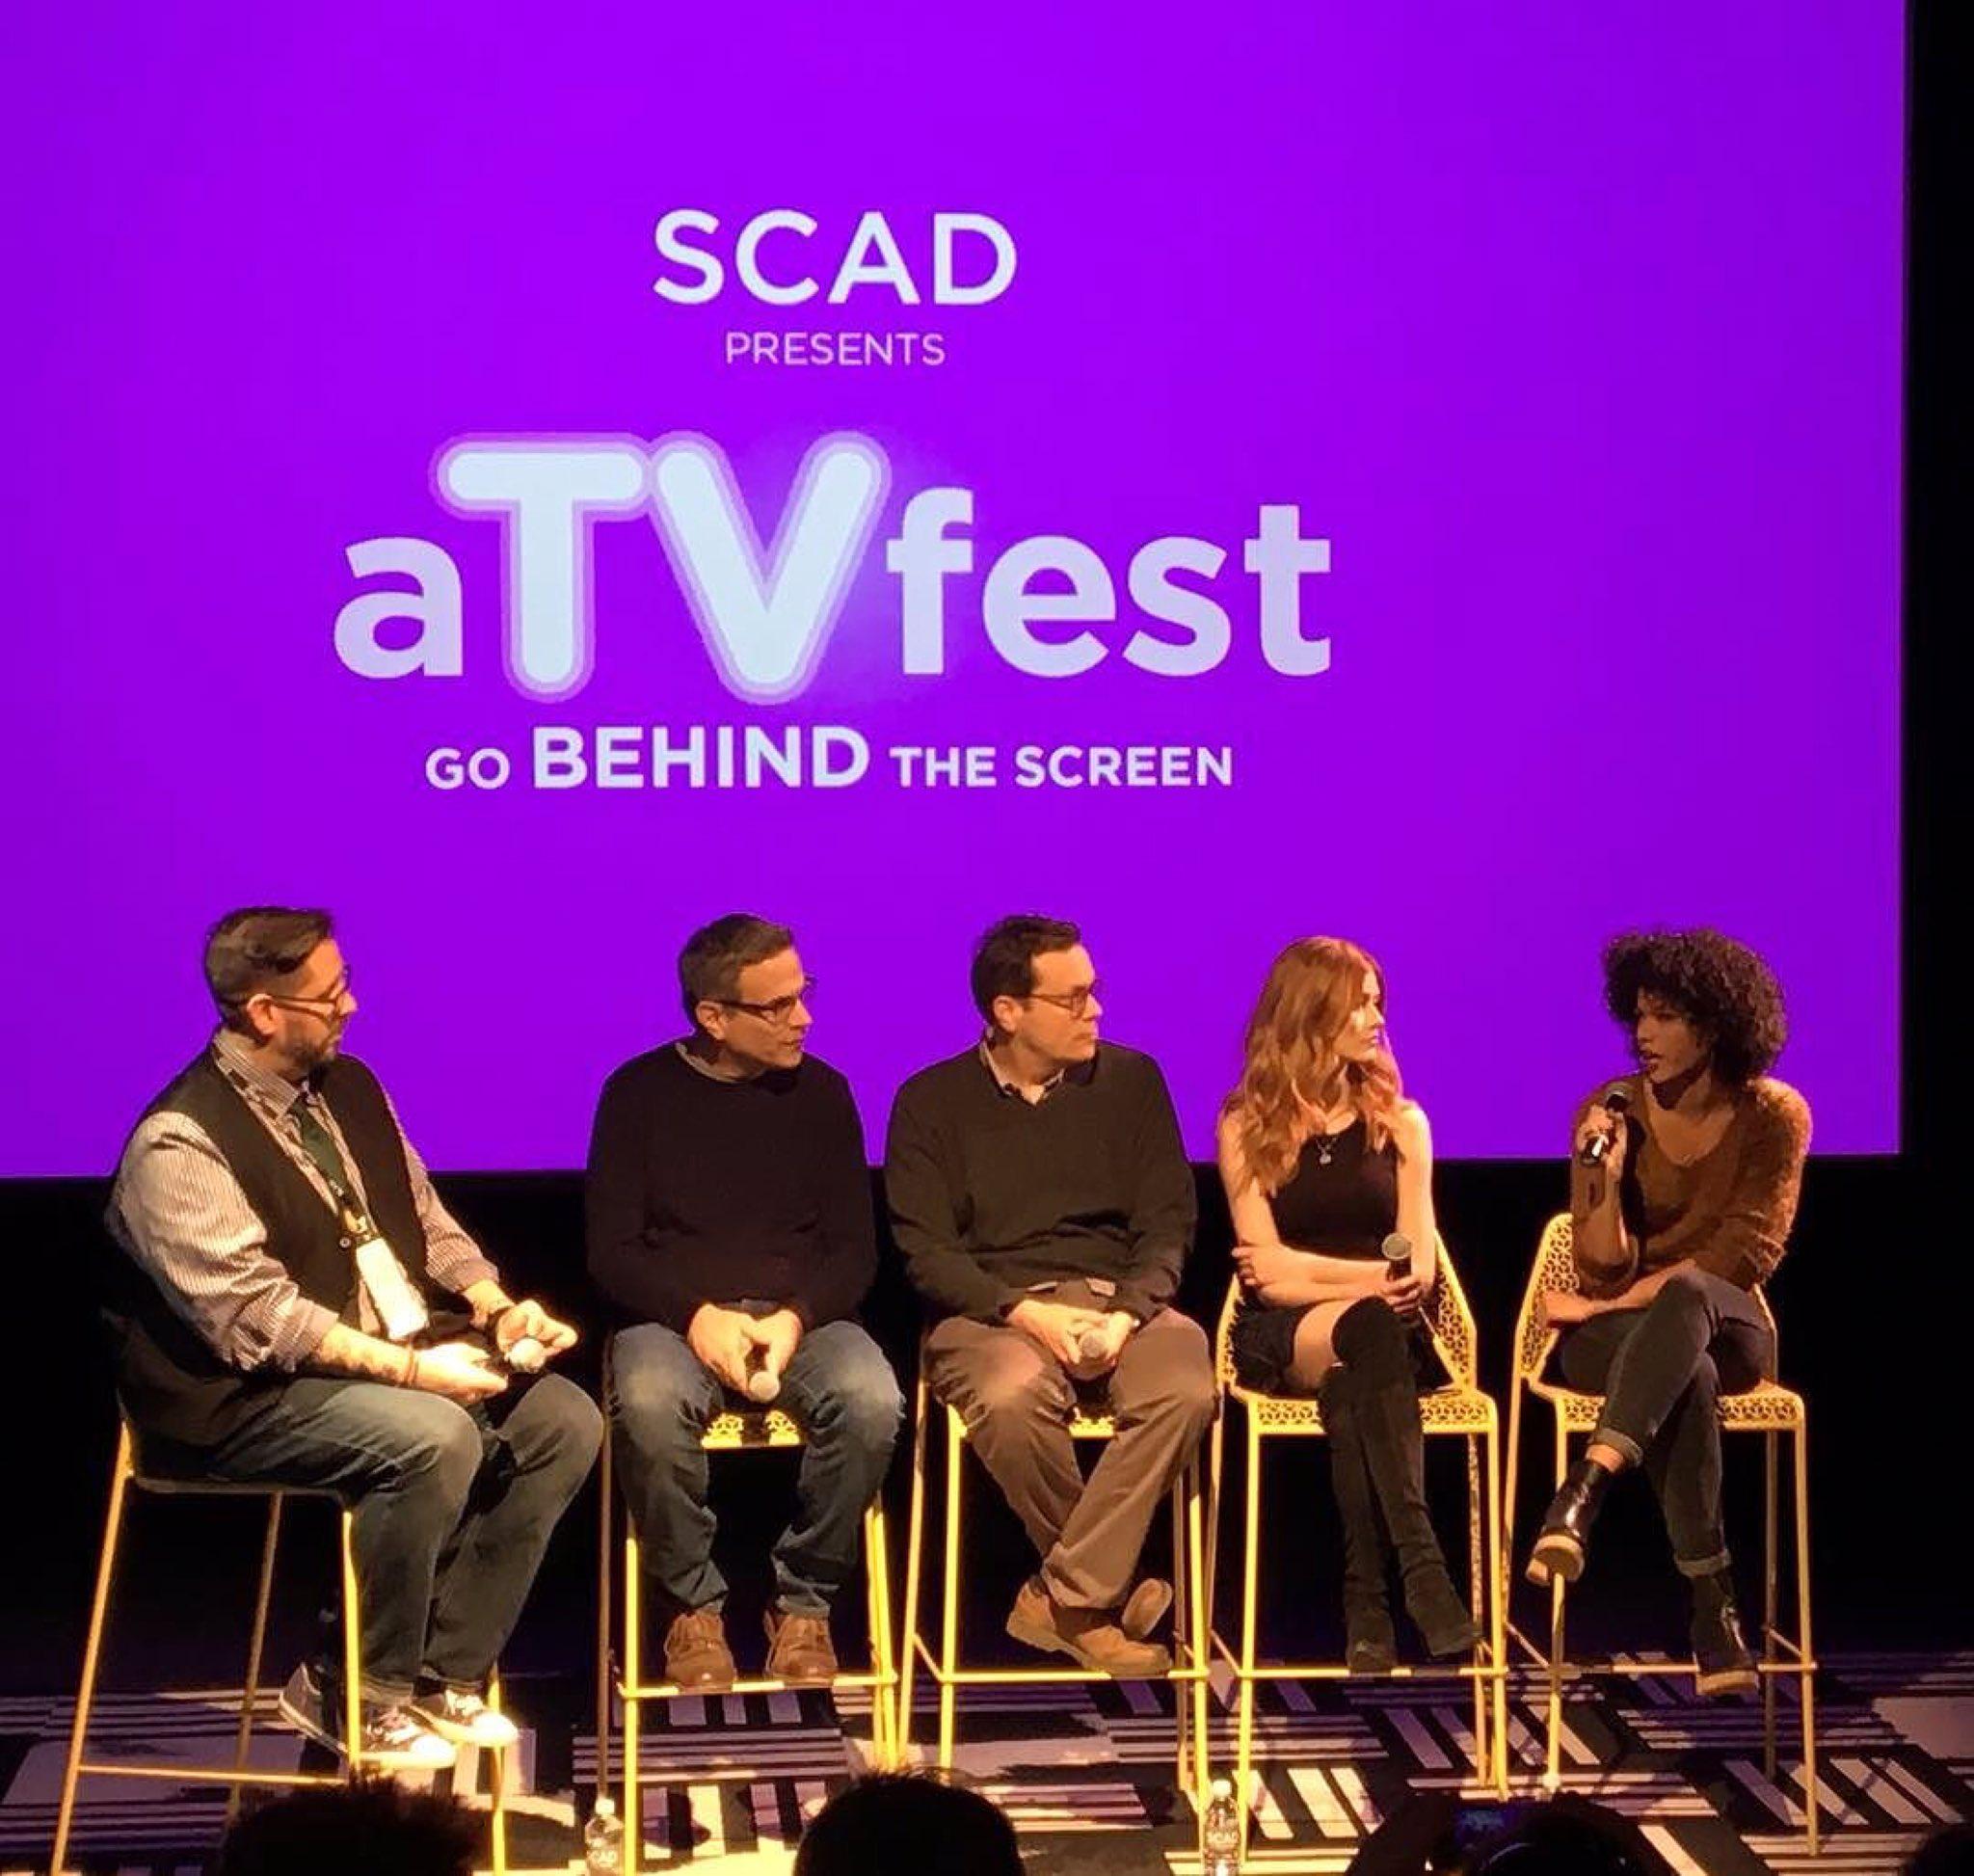 A peek at the #Shadowhunters panel at #aTVfest. 😍  Photo via @TVGuideMagazine's @JimHalterman. https://t.co/YbDjJxvhBh